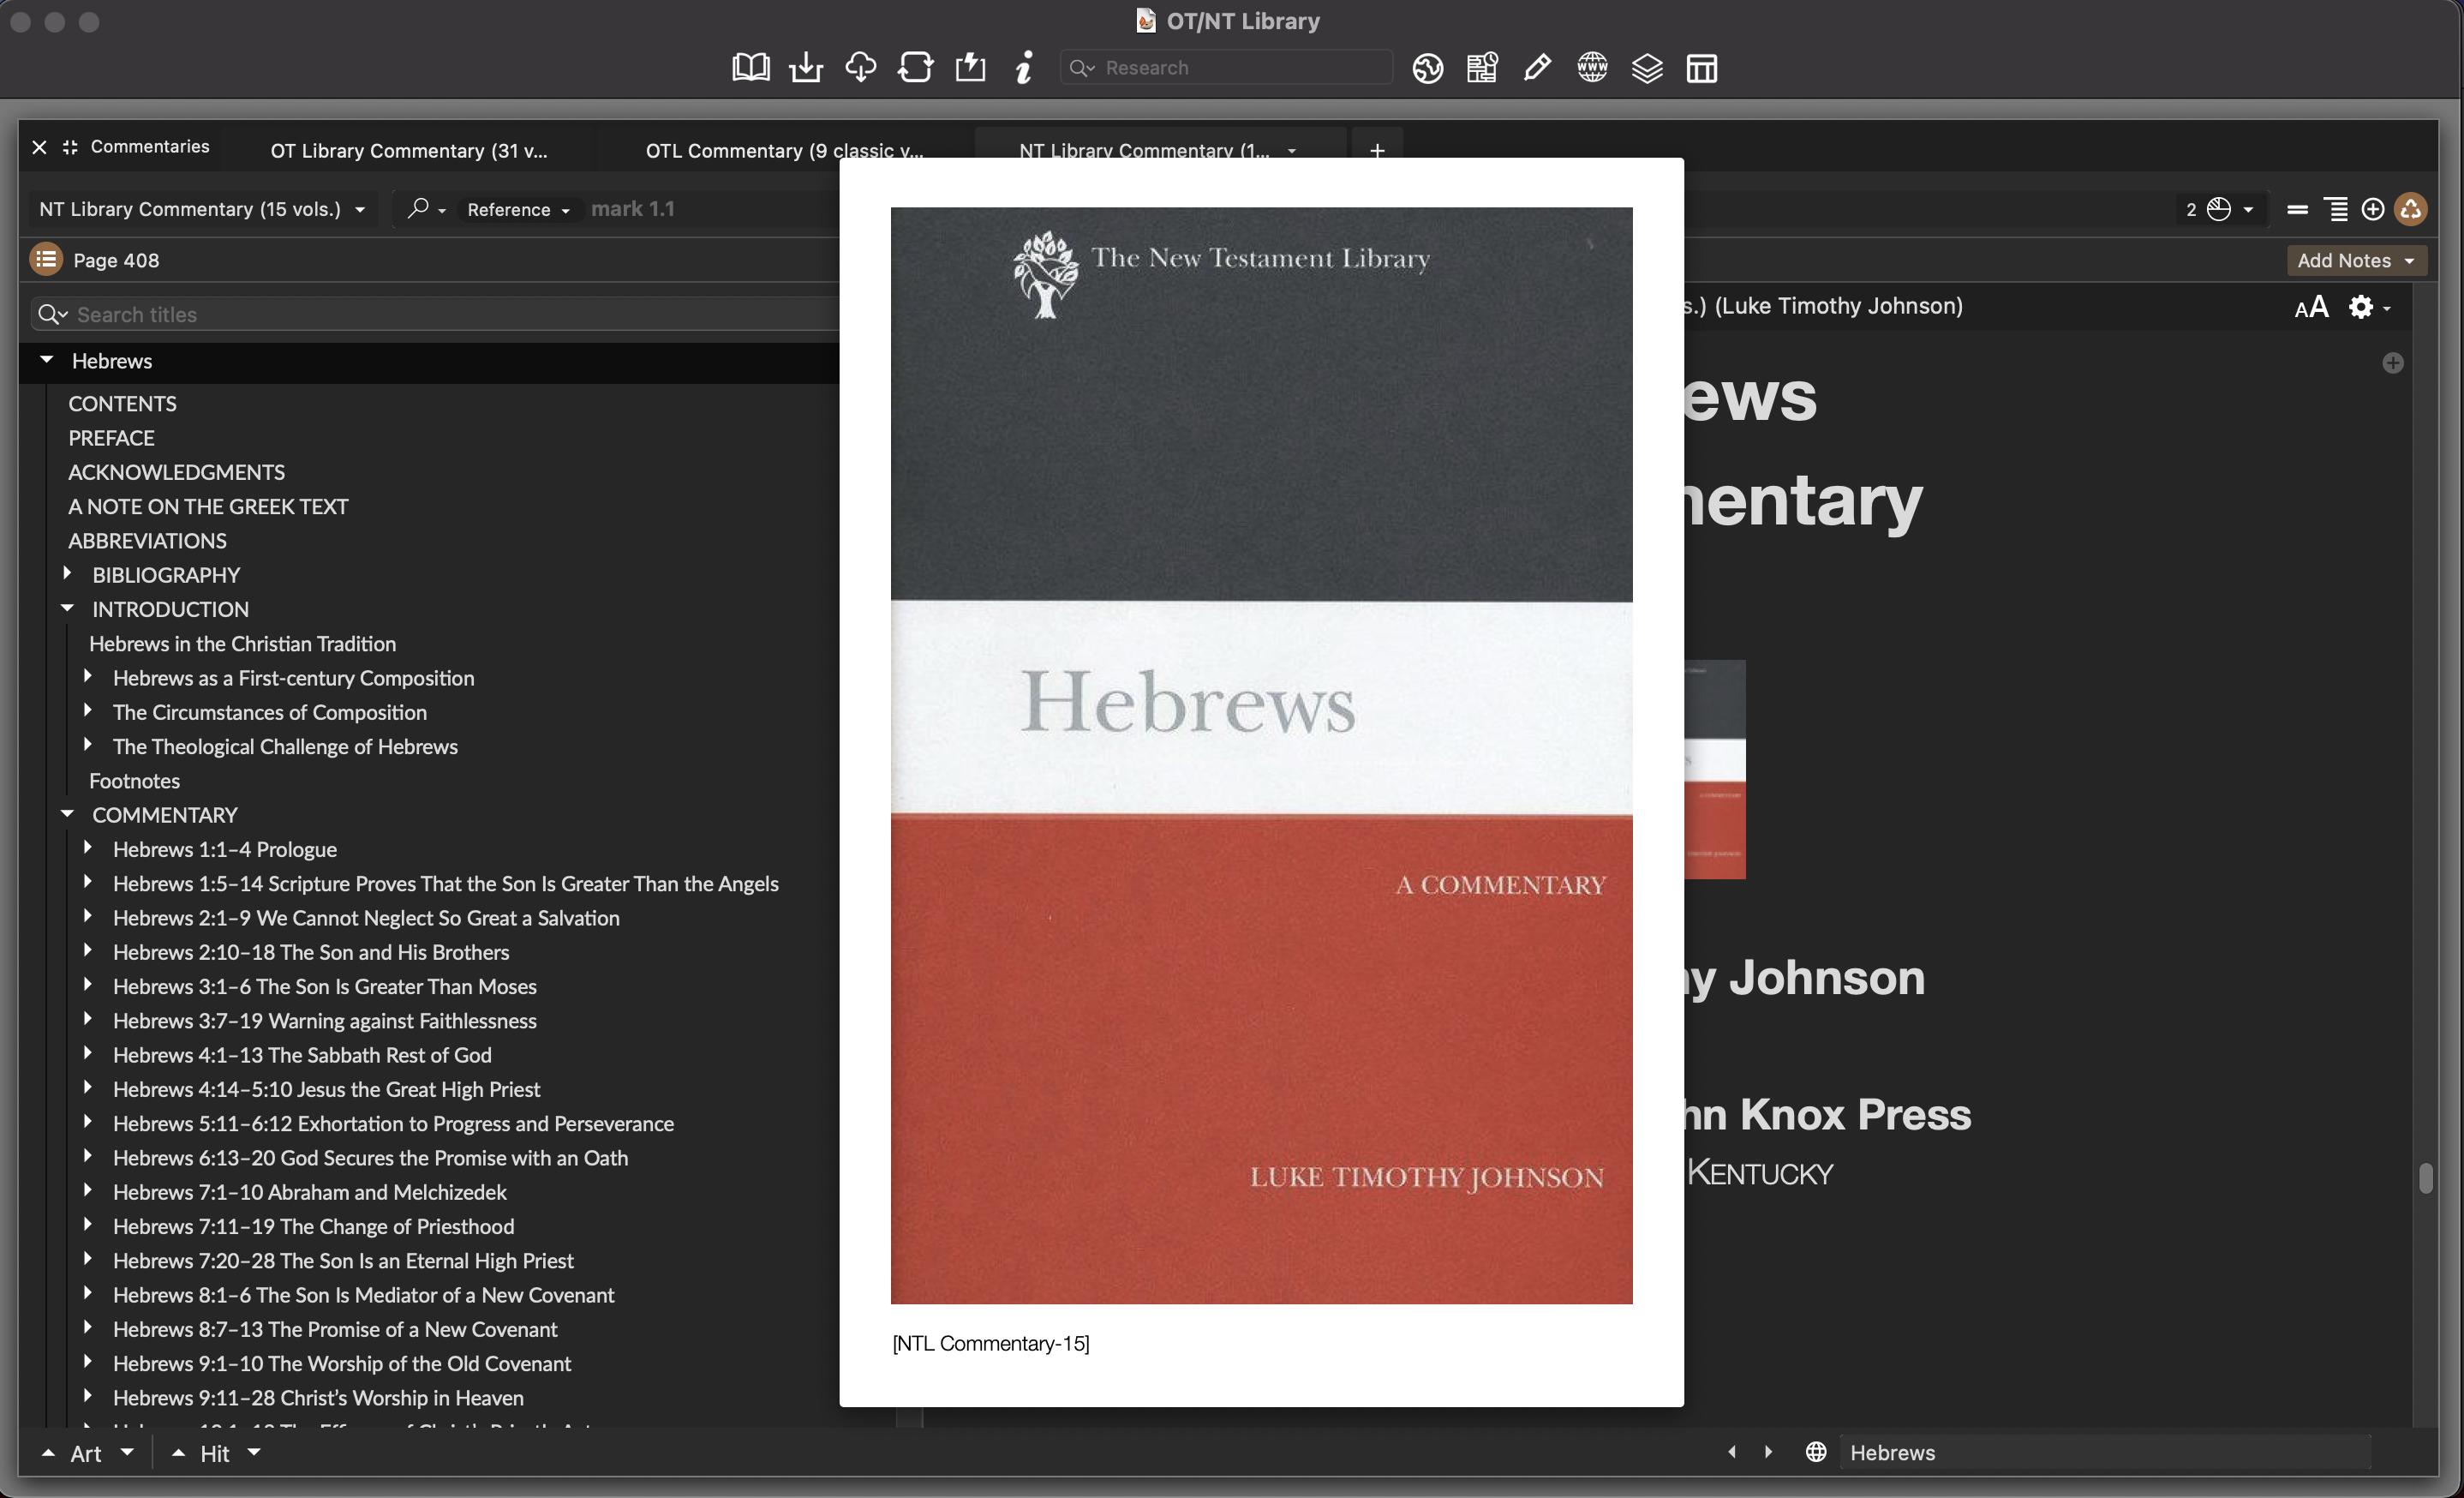 Luke Timothy Johnson on Hebrews –Dark Mode in Accordance